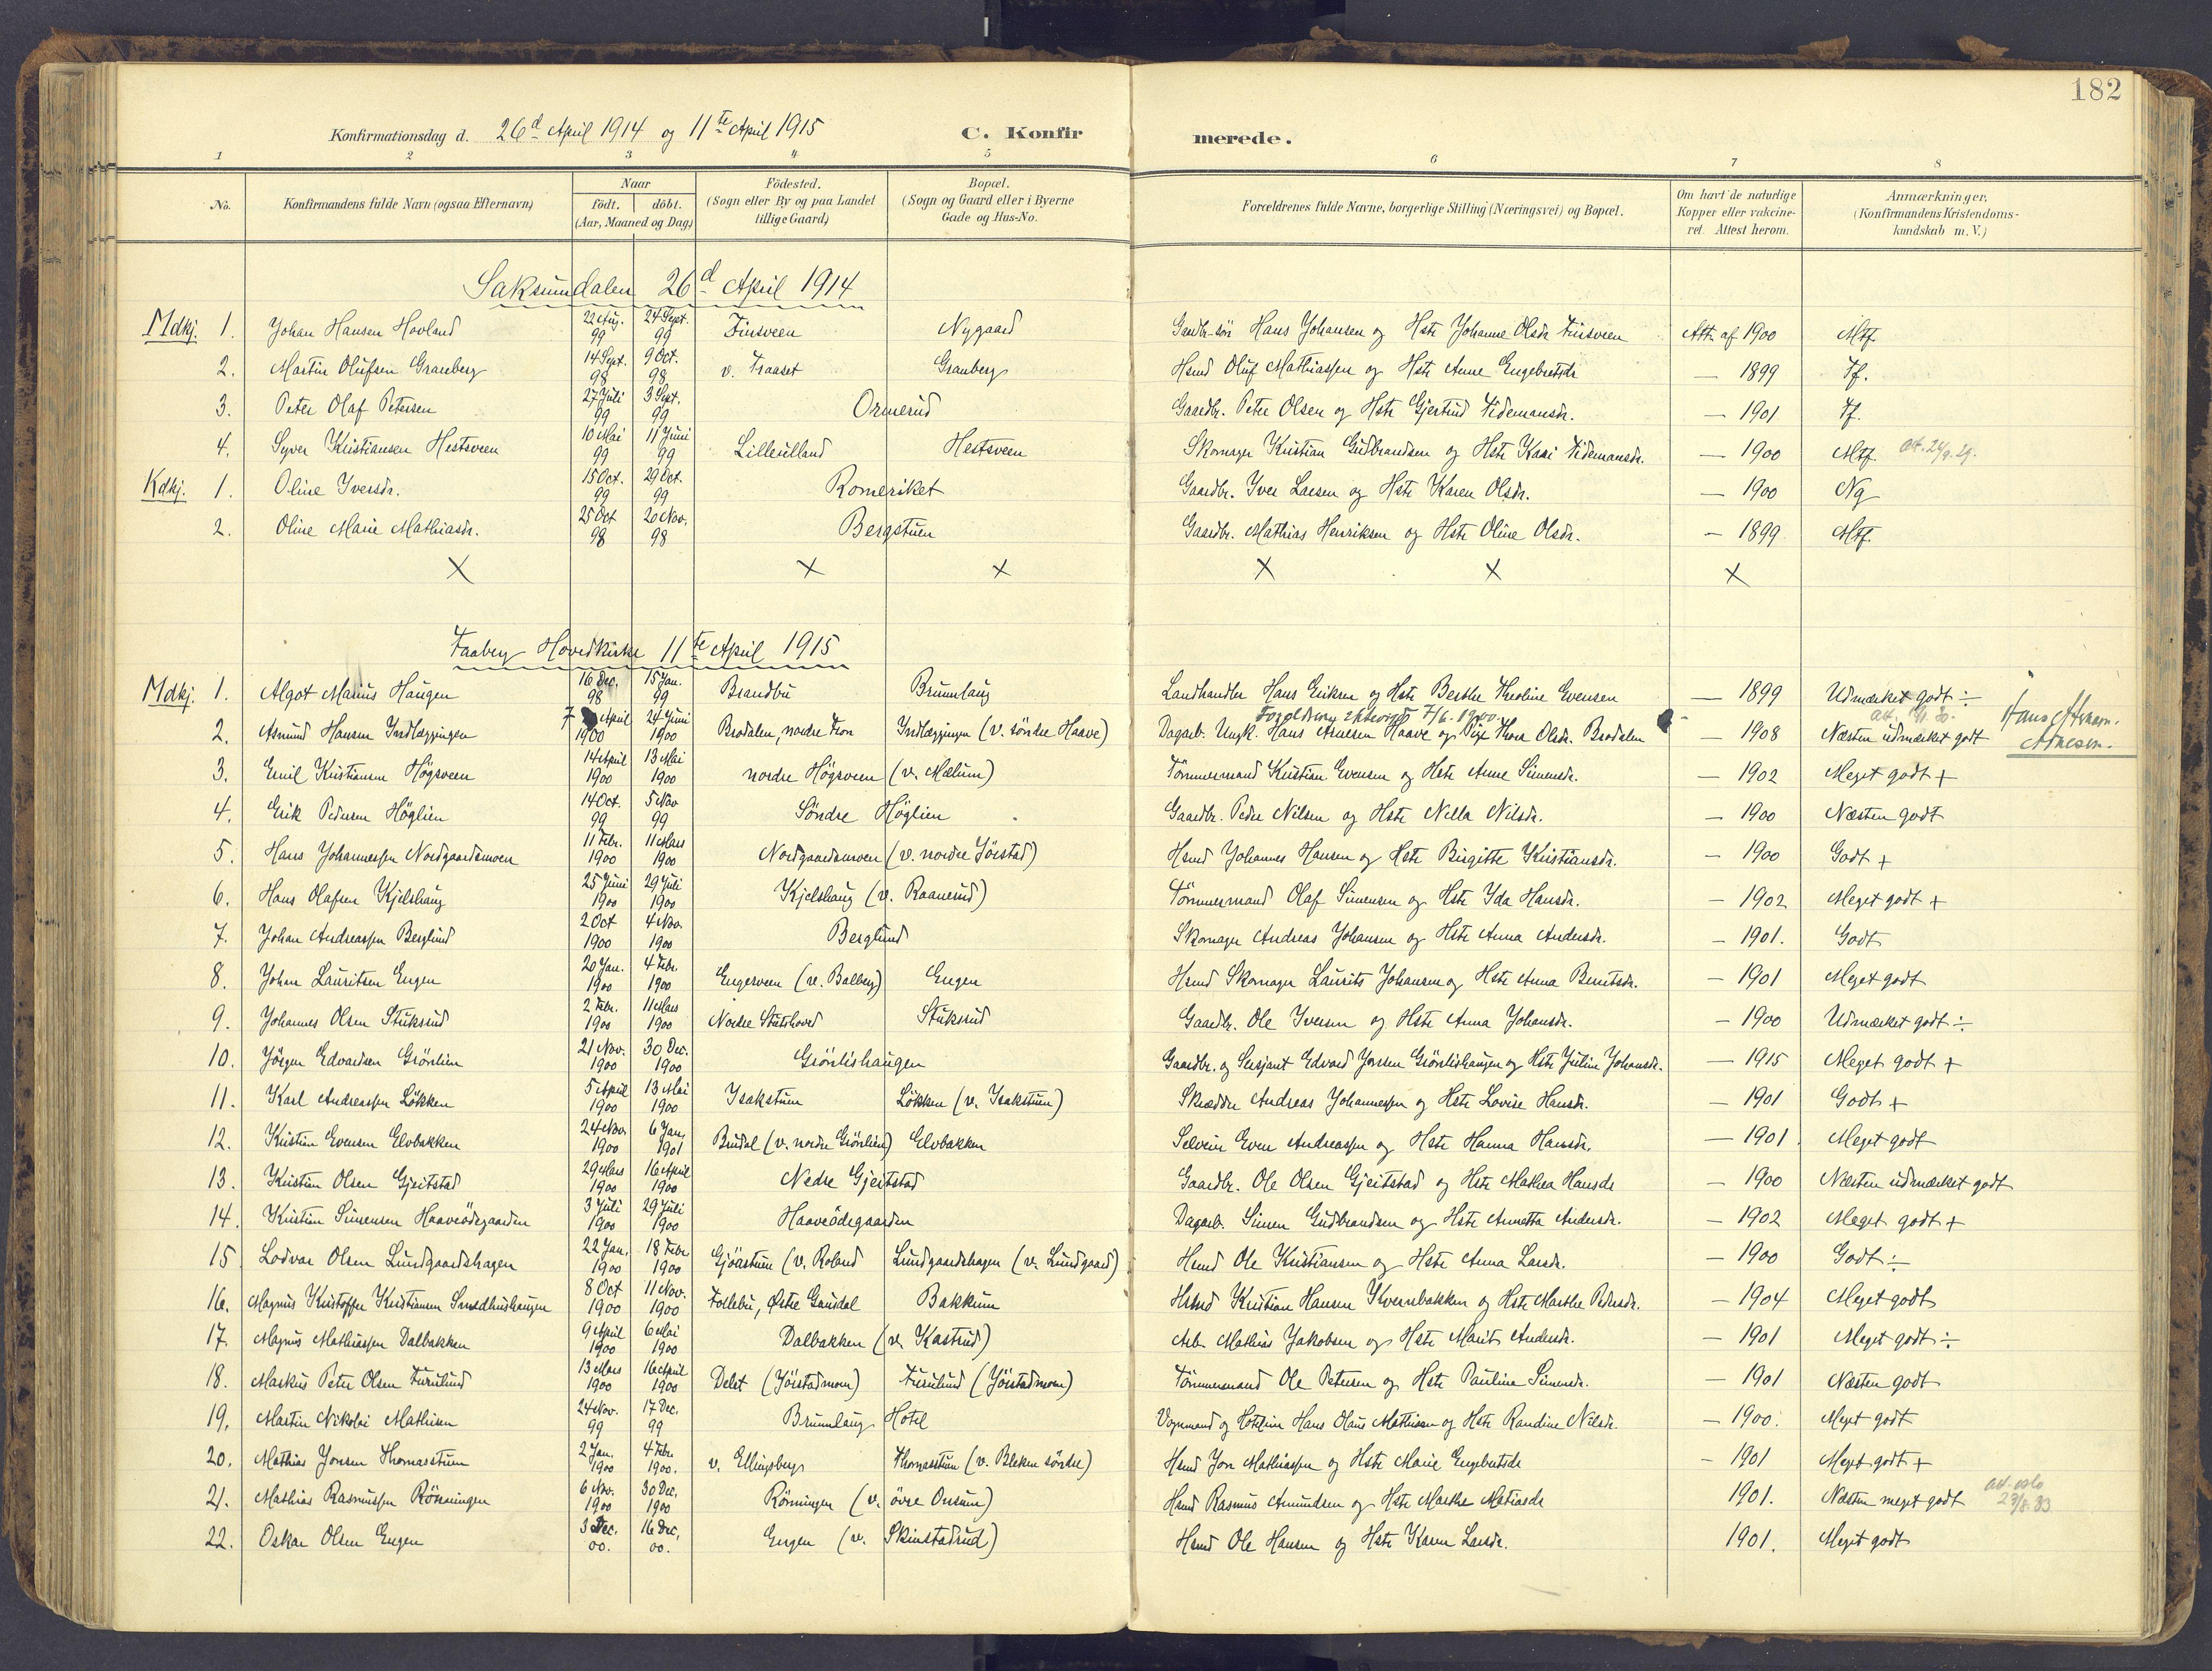 SAH, Fåberg prestekontor, Ministerialbok nr. 12, 1899-1915, s. 182